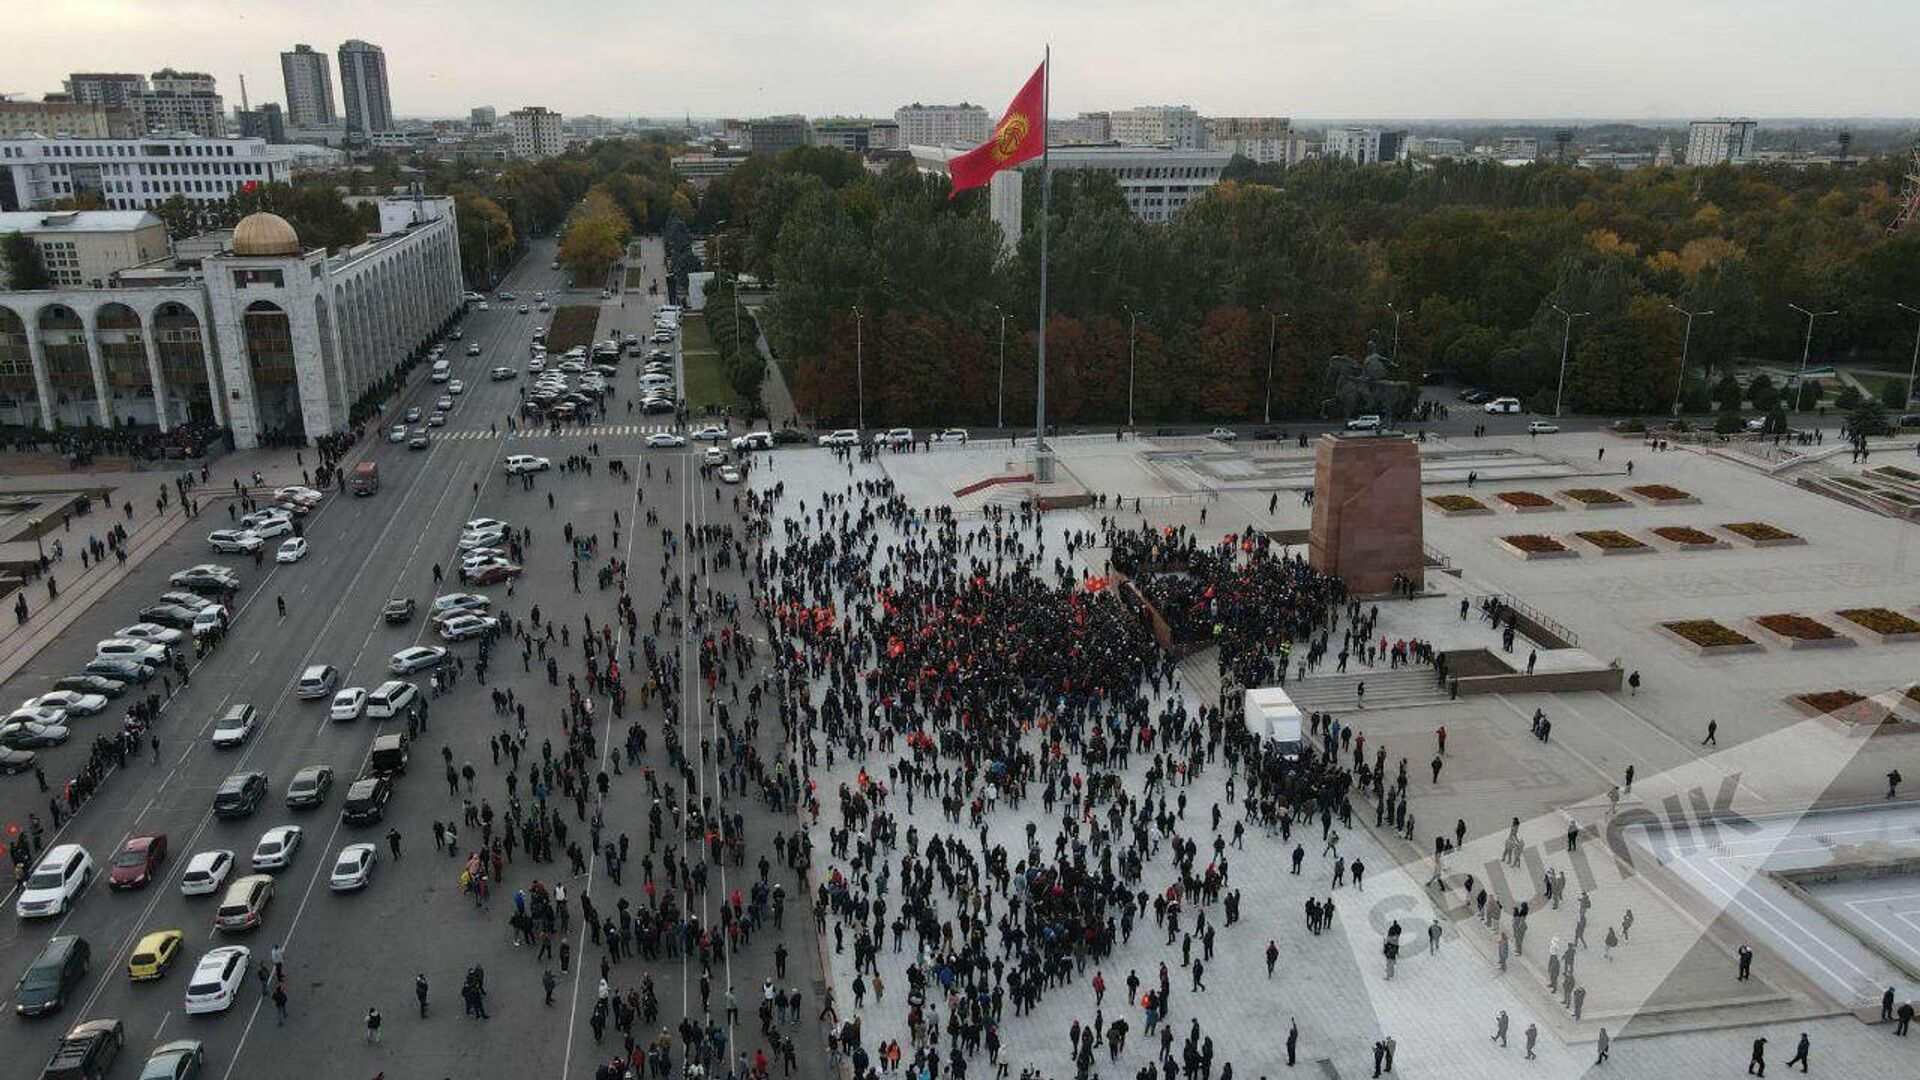 Ситуация в центре Бишкека. 9 октября 2020 - РИА Новости, 1920, 24.10.2020